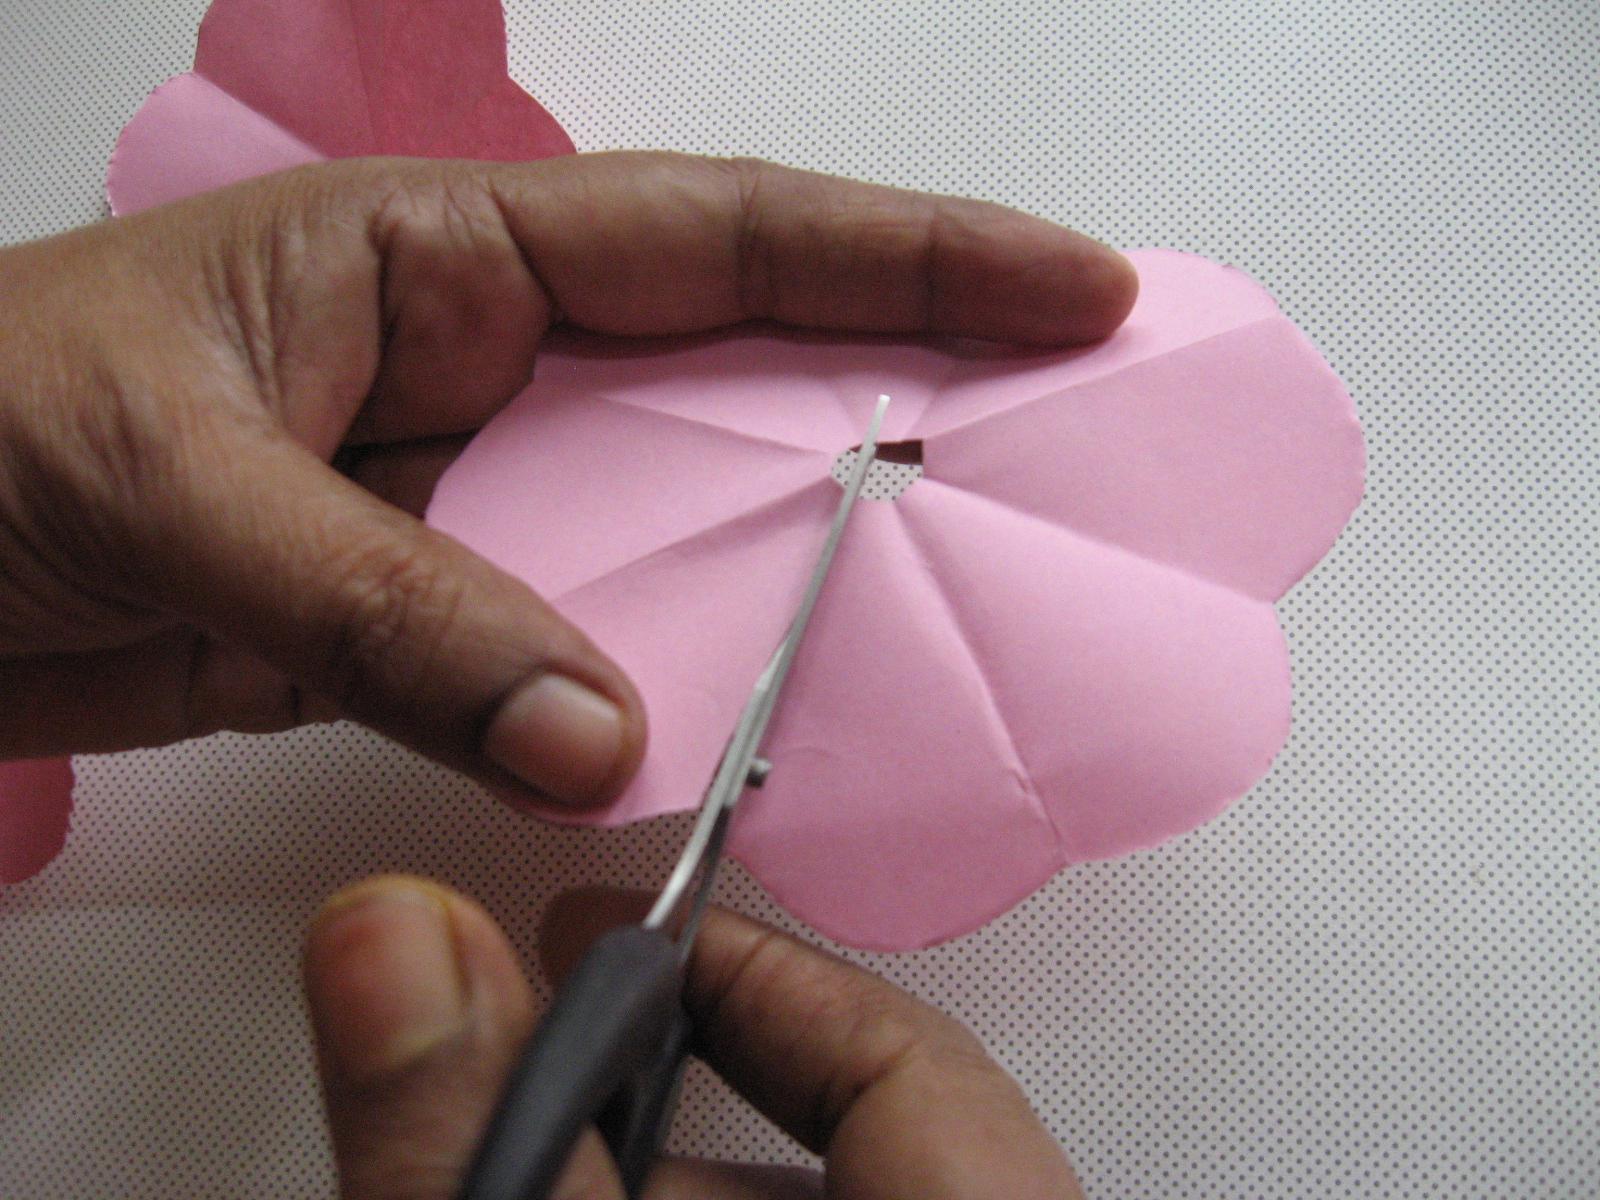 Picture of Cut Segments